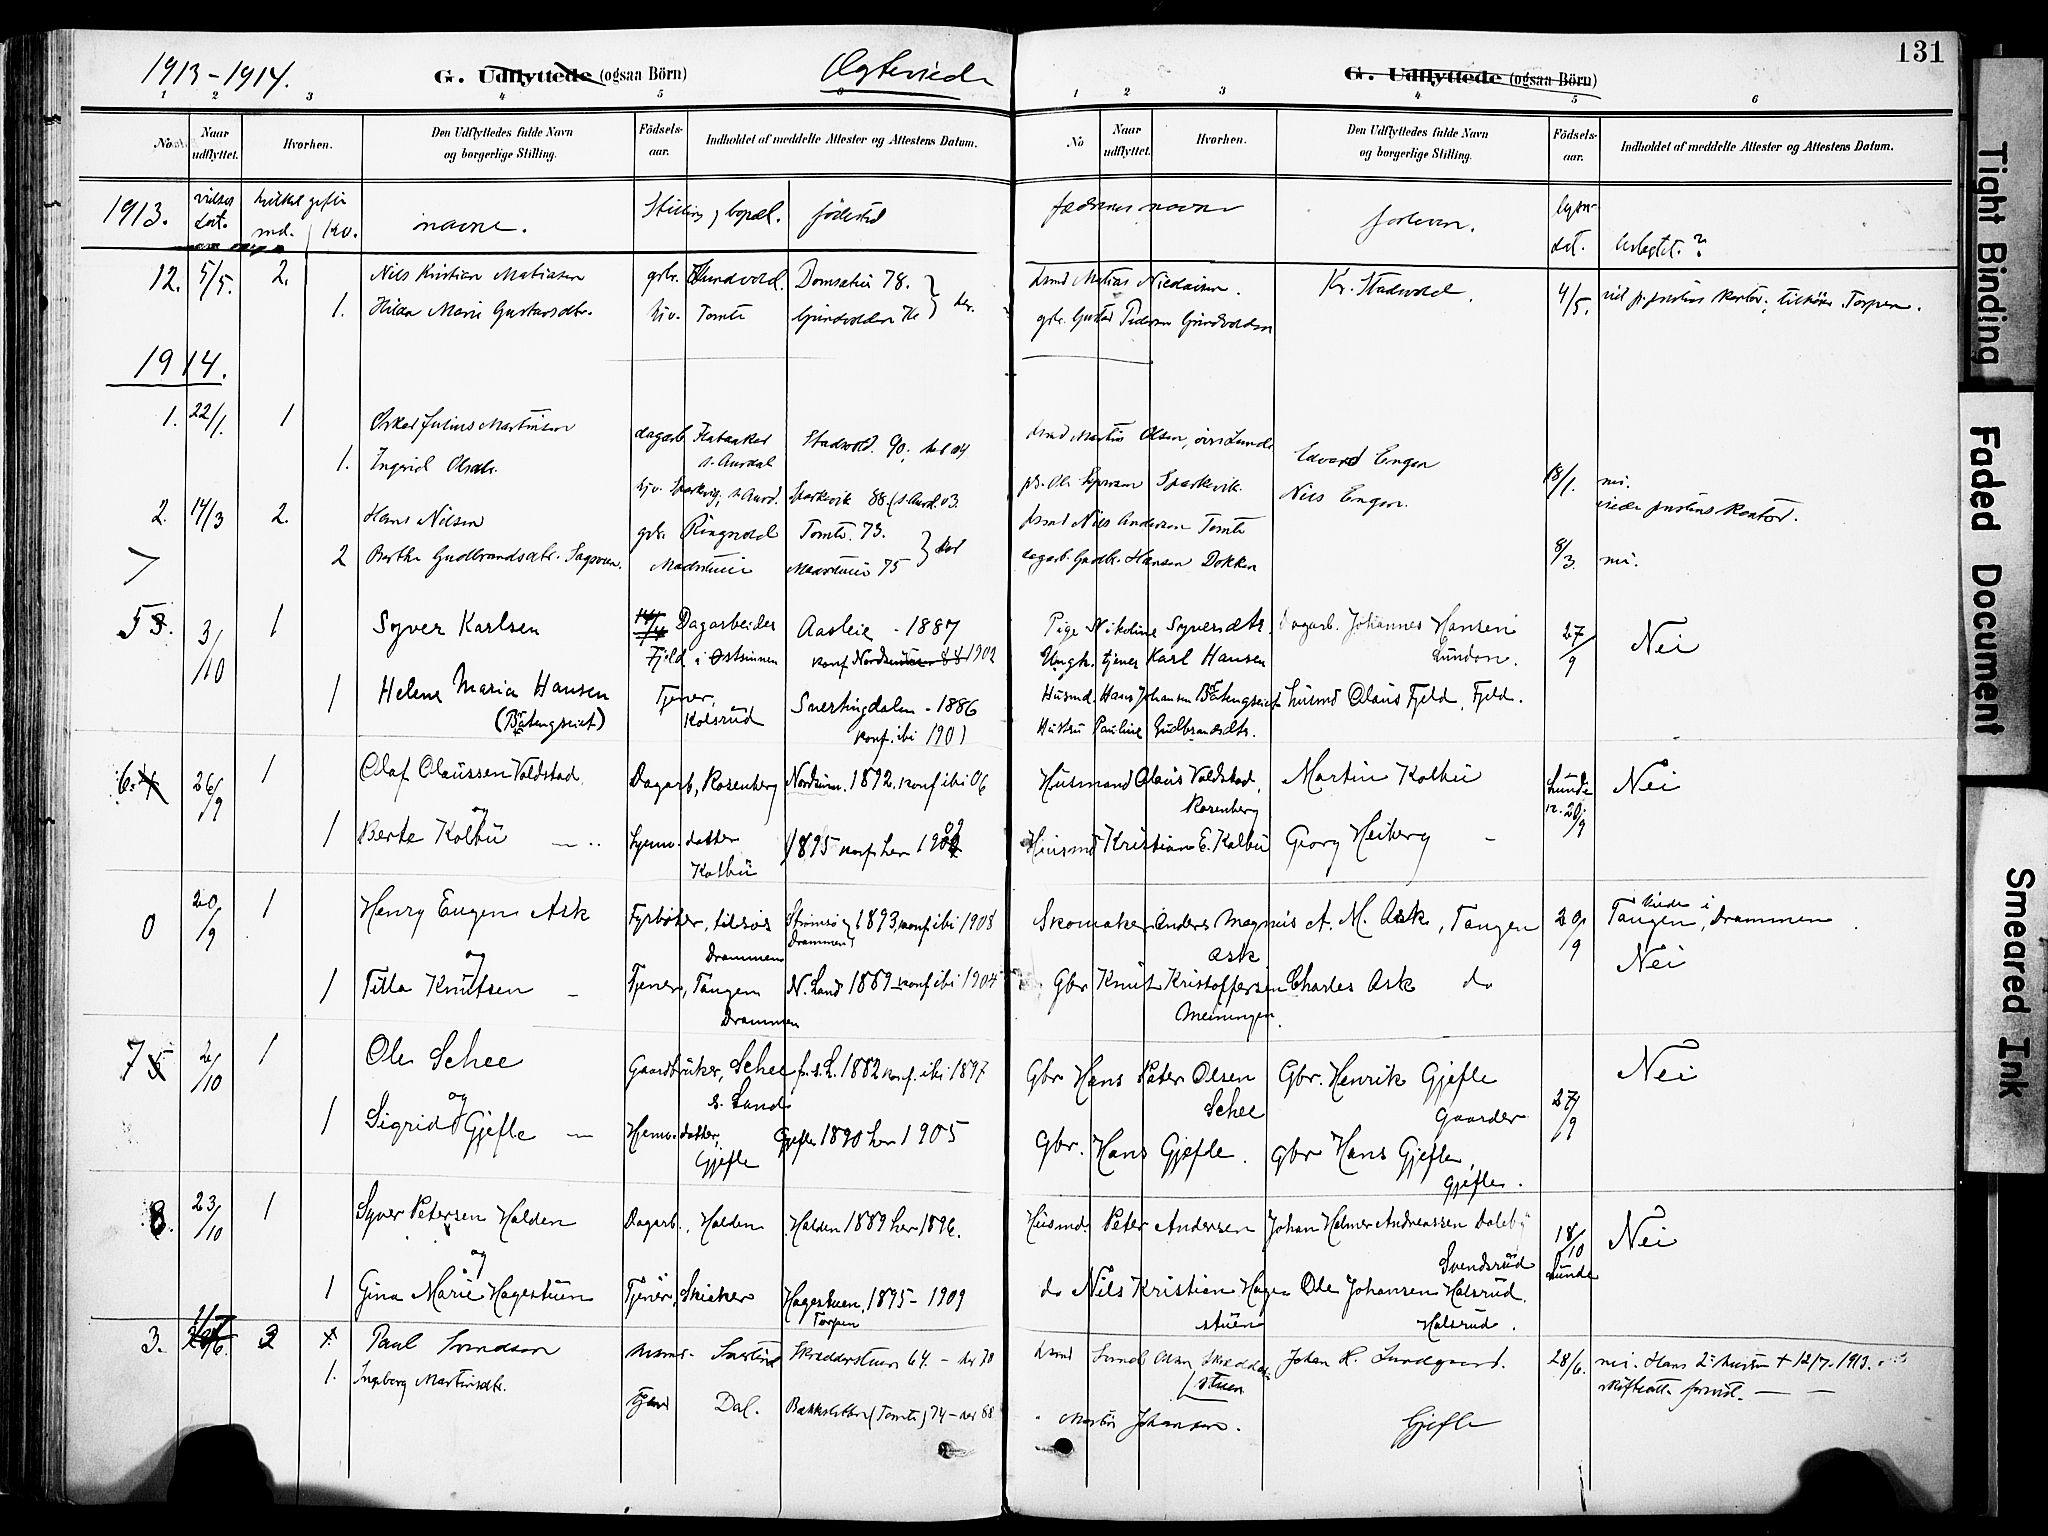 SAH, Nordre Land prestekontor, Ministerialbok nr. 6, 1897-1914, s. 131